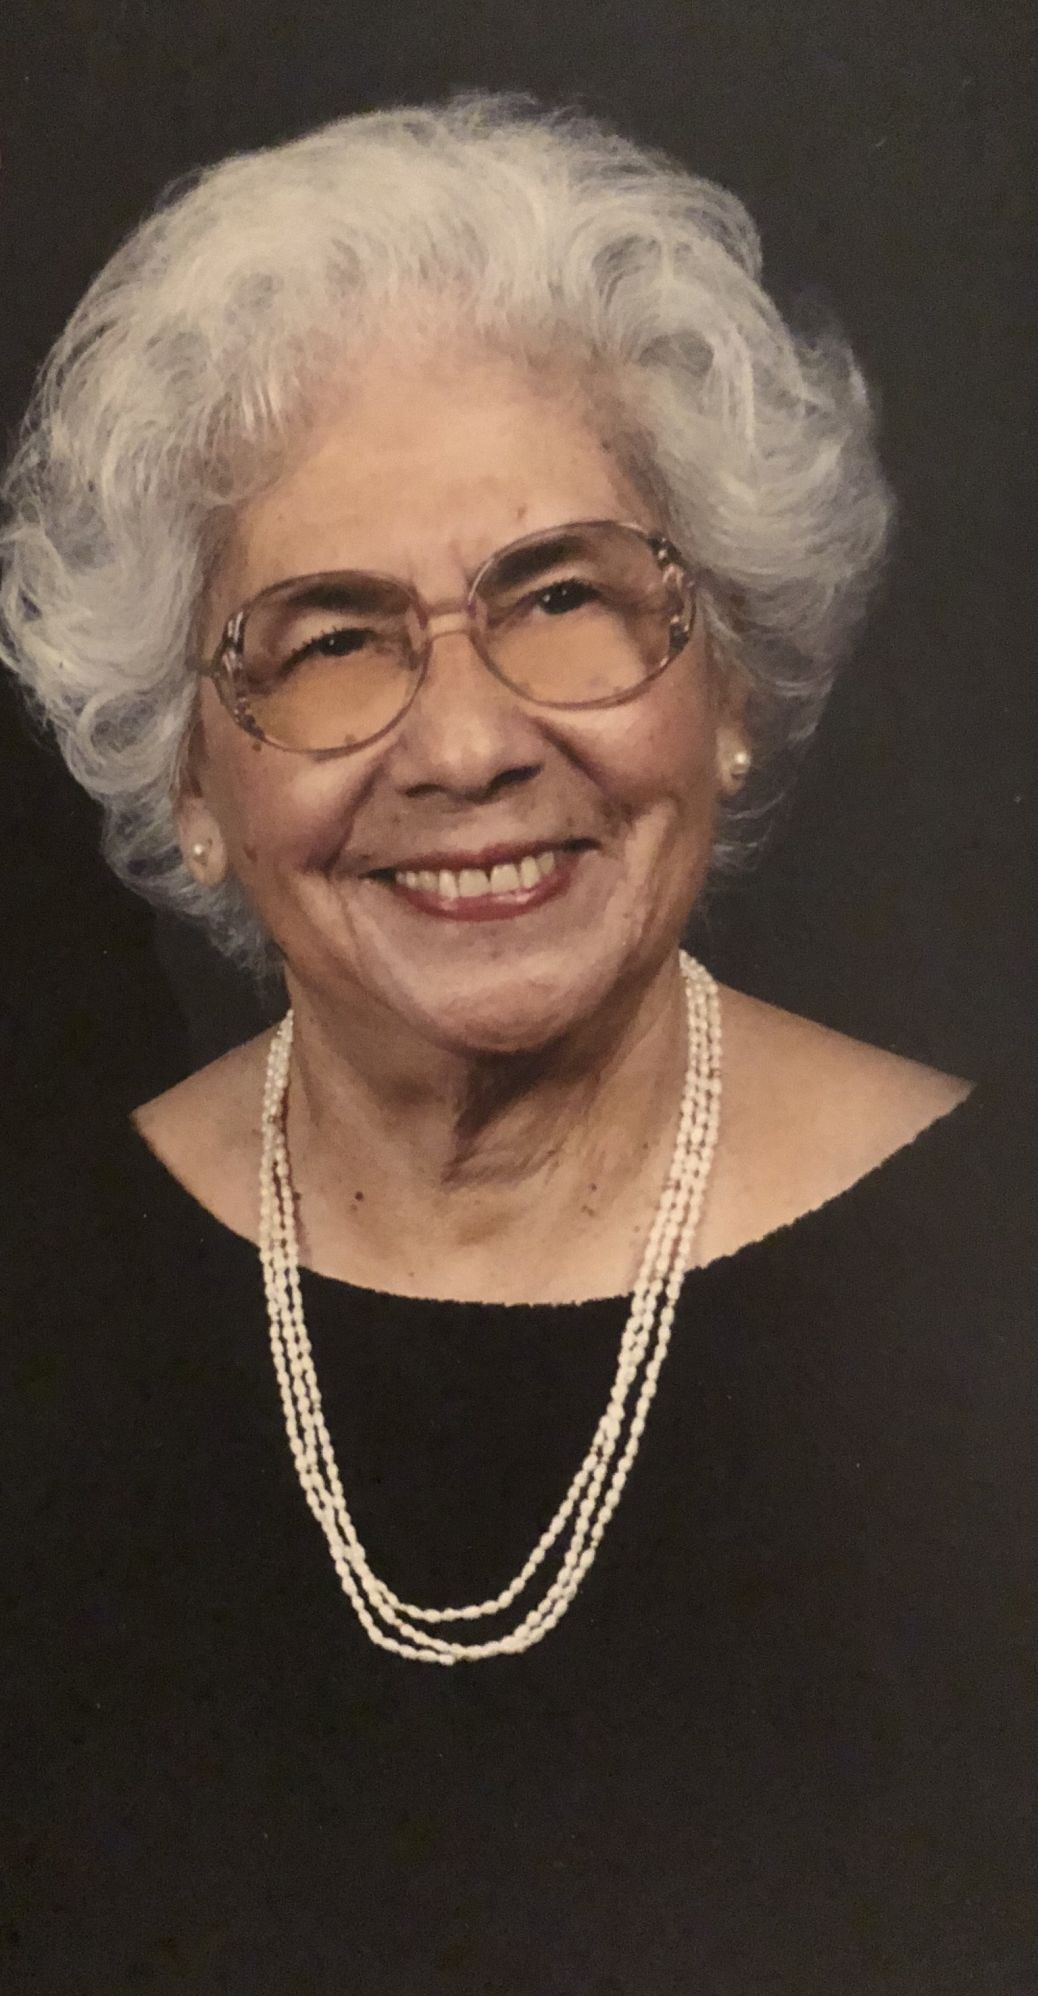 Caroline C. Perez